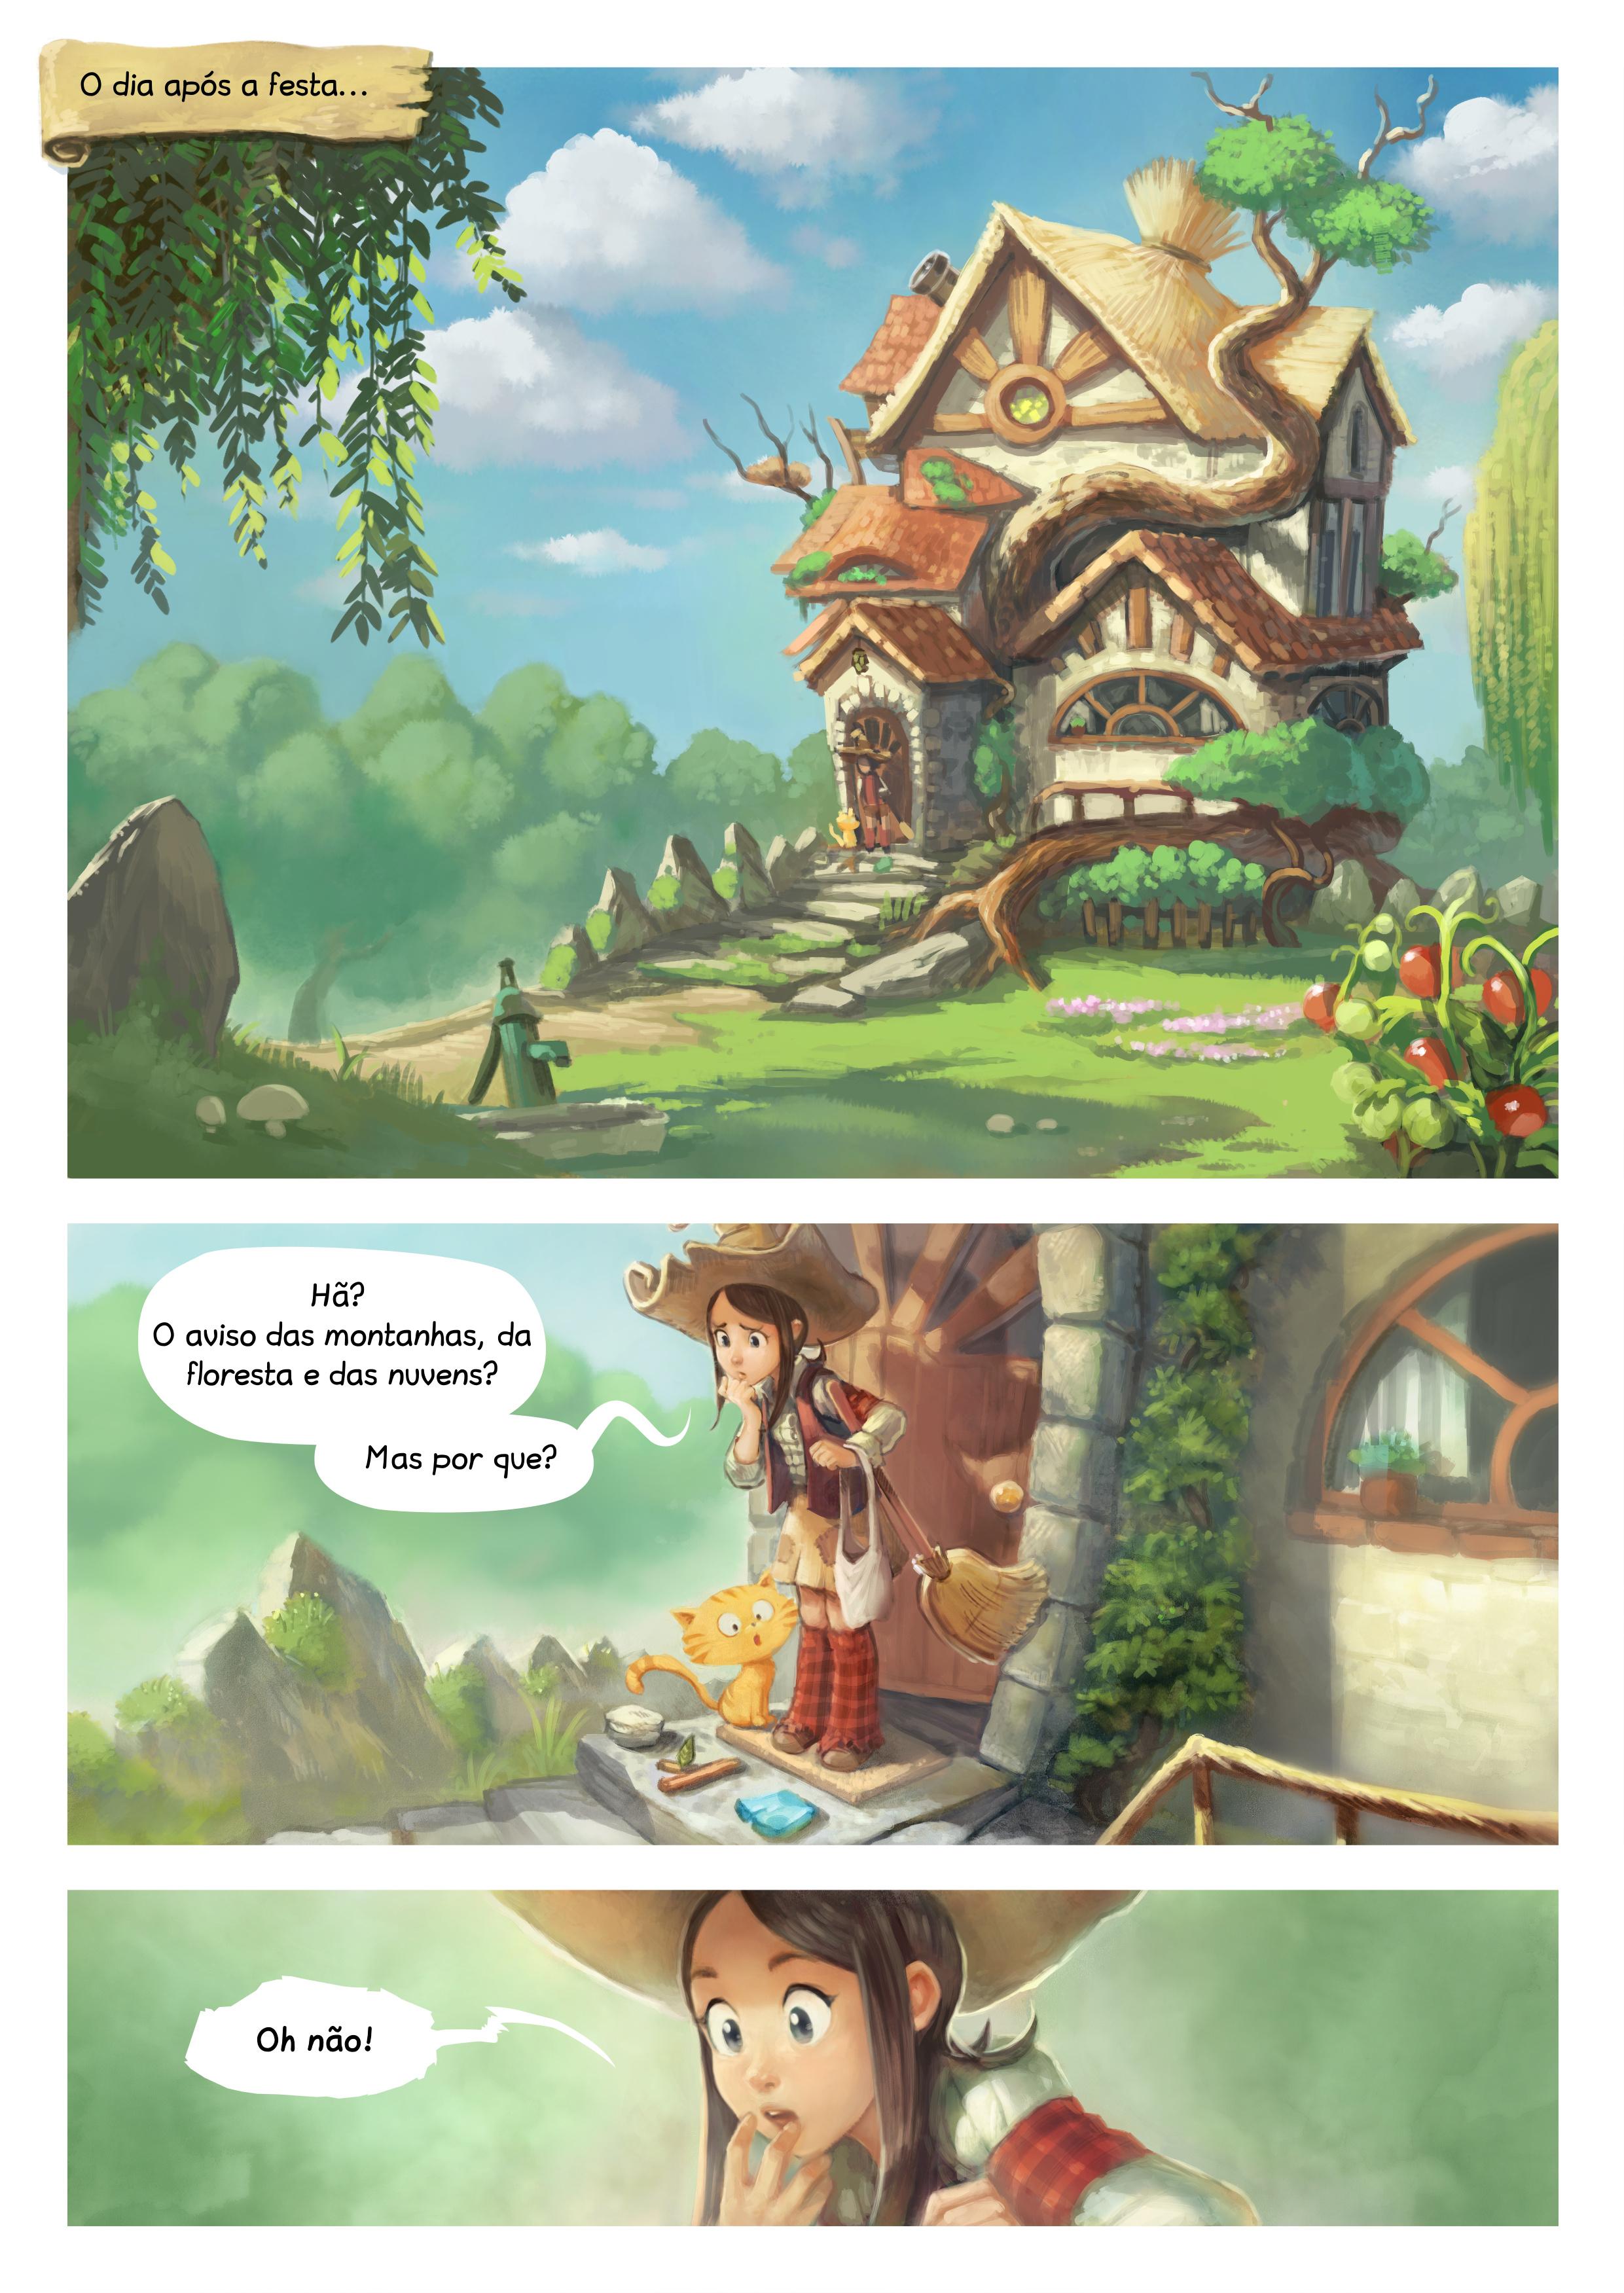 A webcomic page of Pepper&Carrot, episódio 9 [pt], página 1